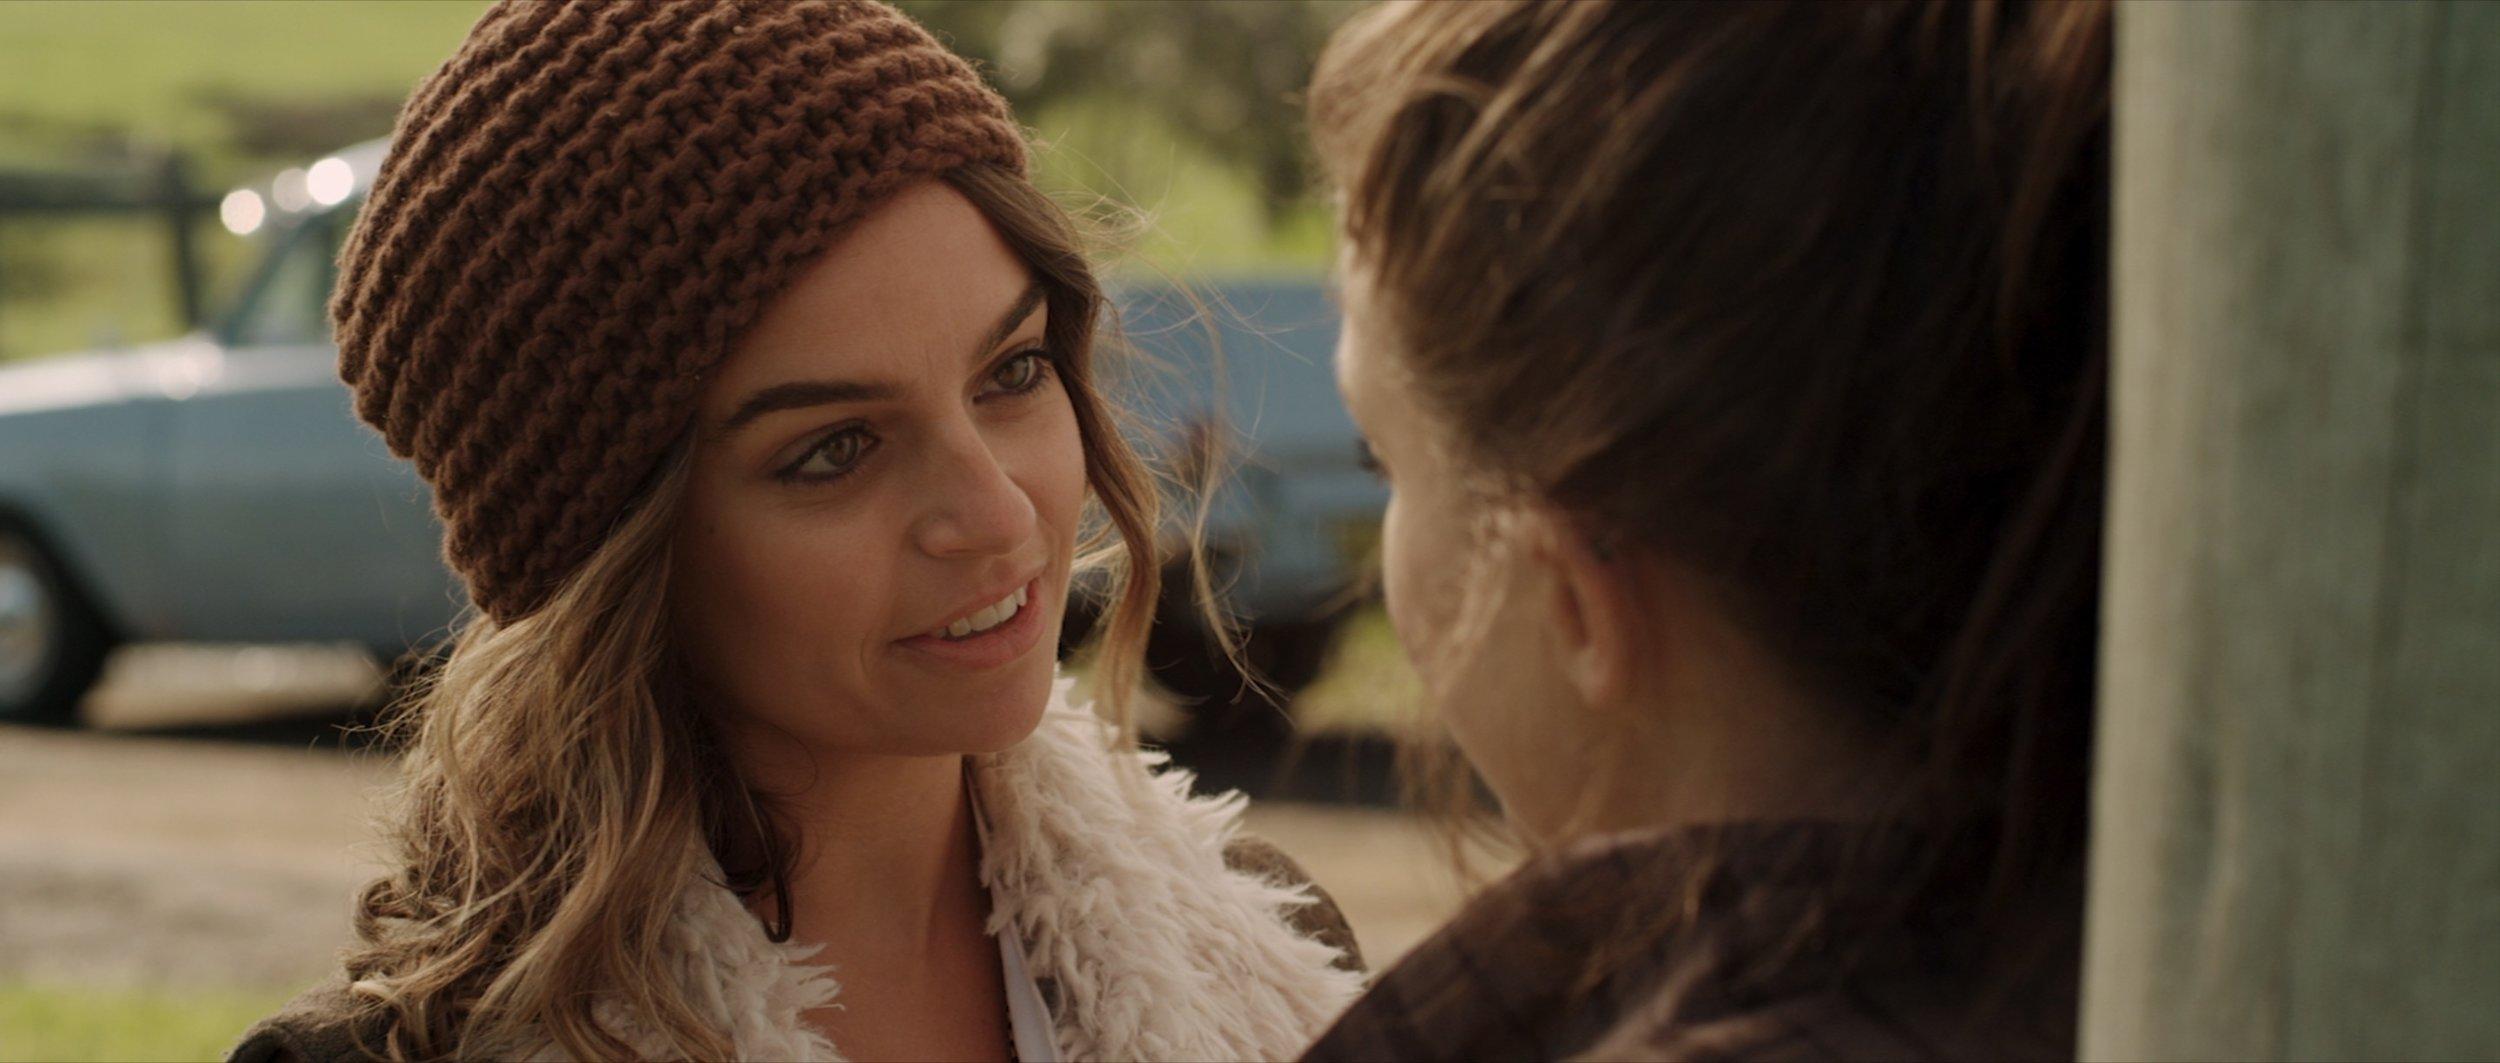 Kate Halpin Director Film 10 - Bianca Bradey